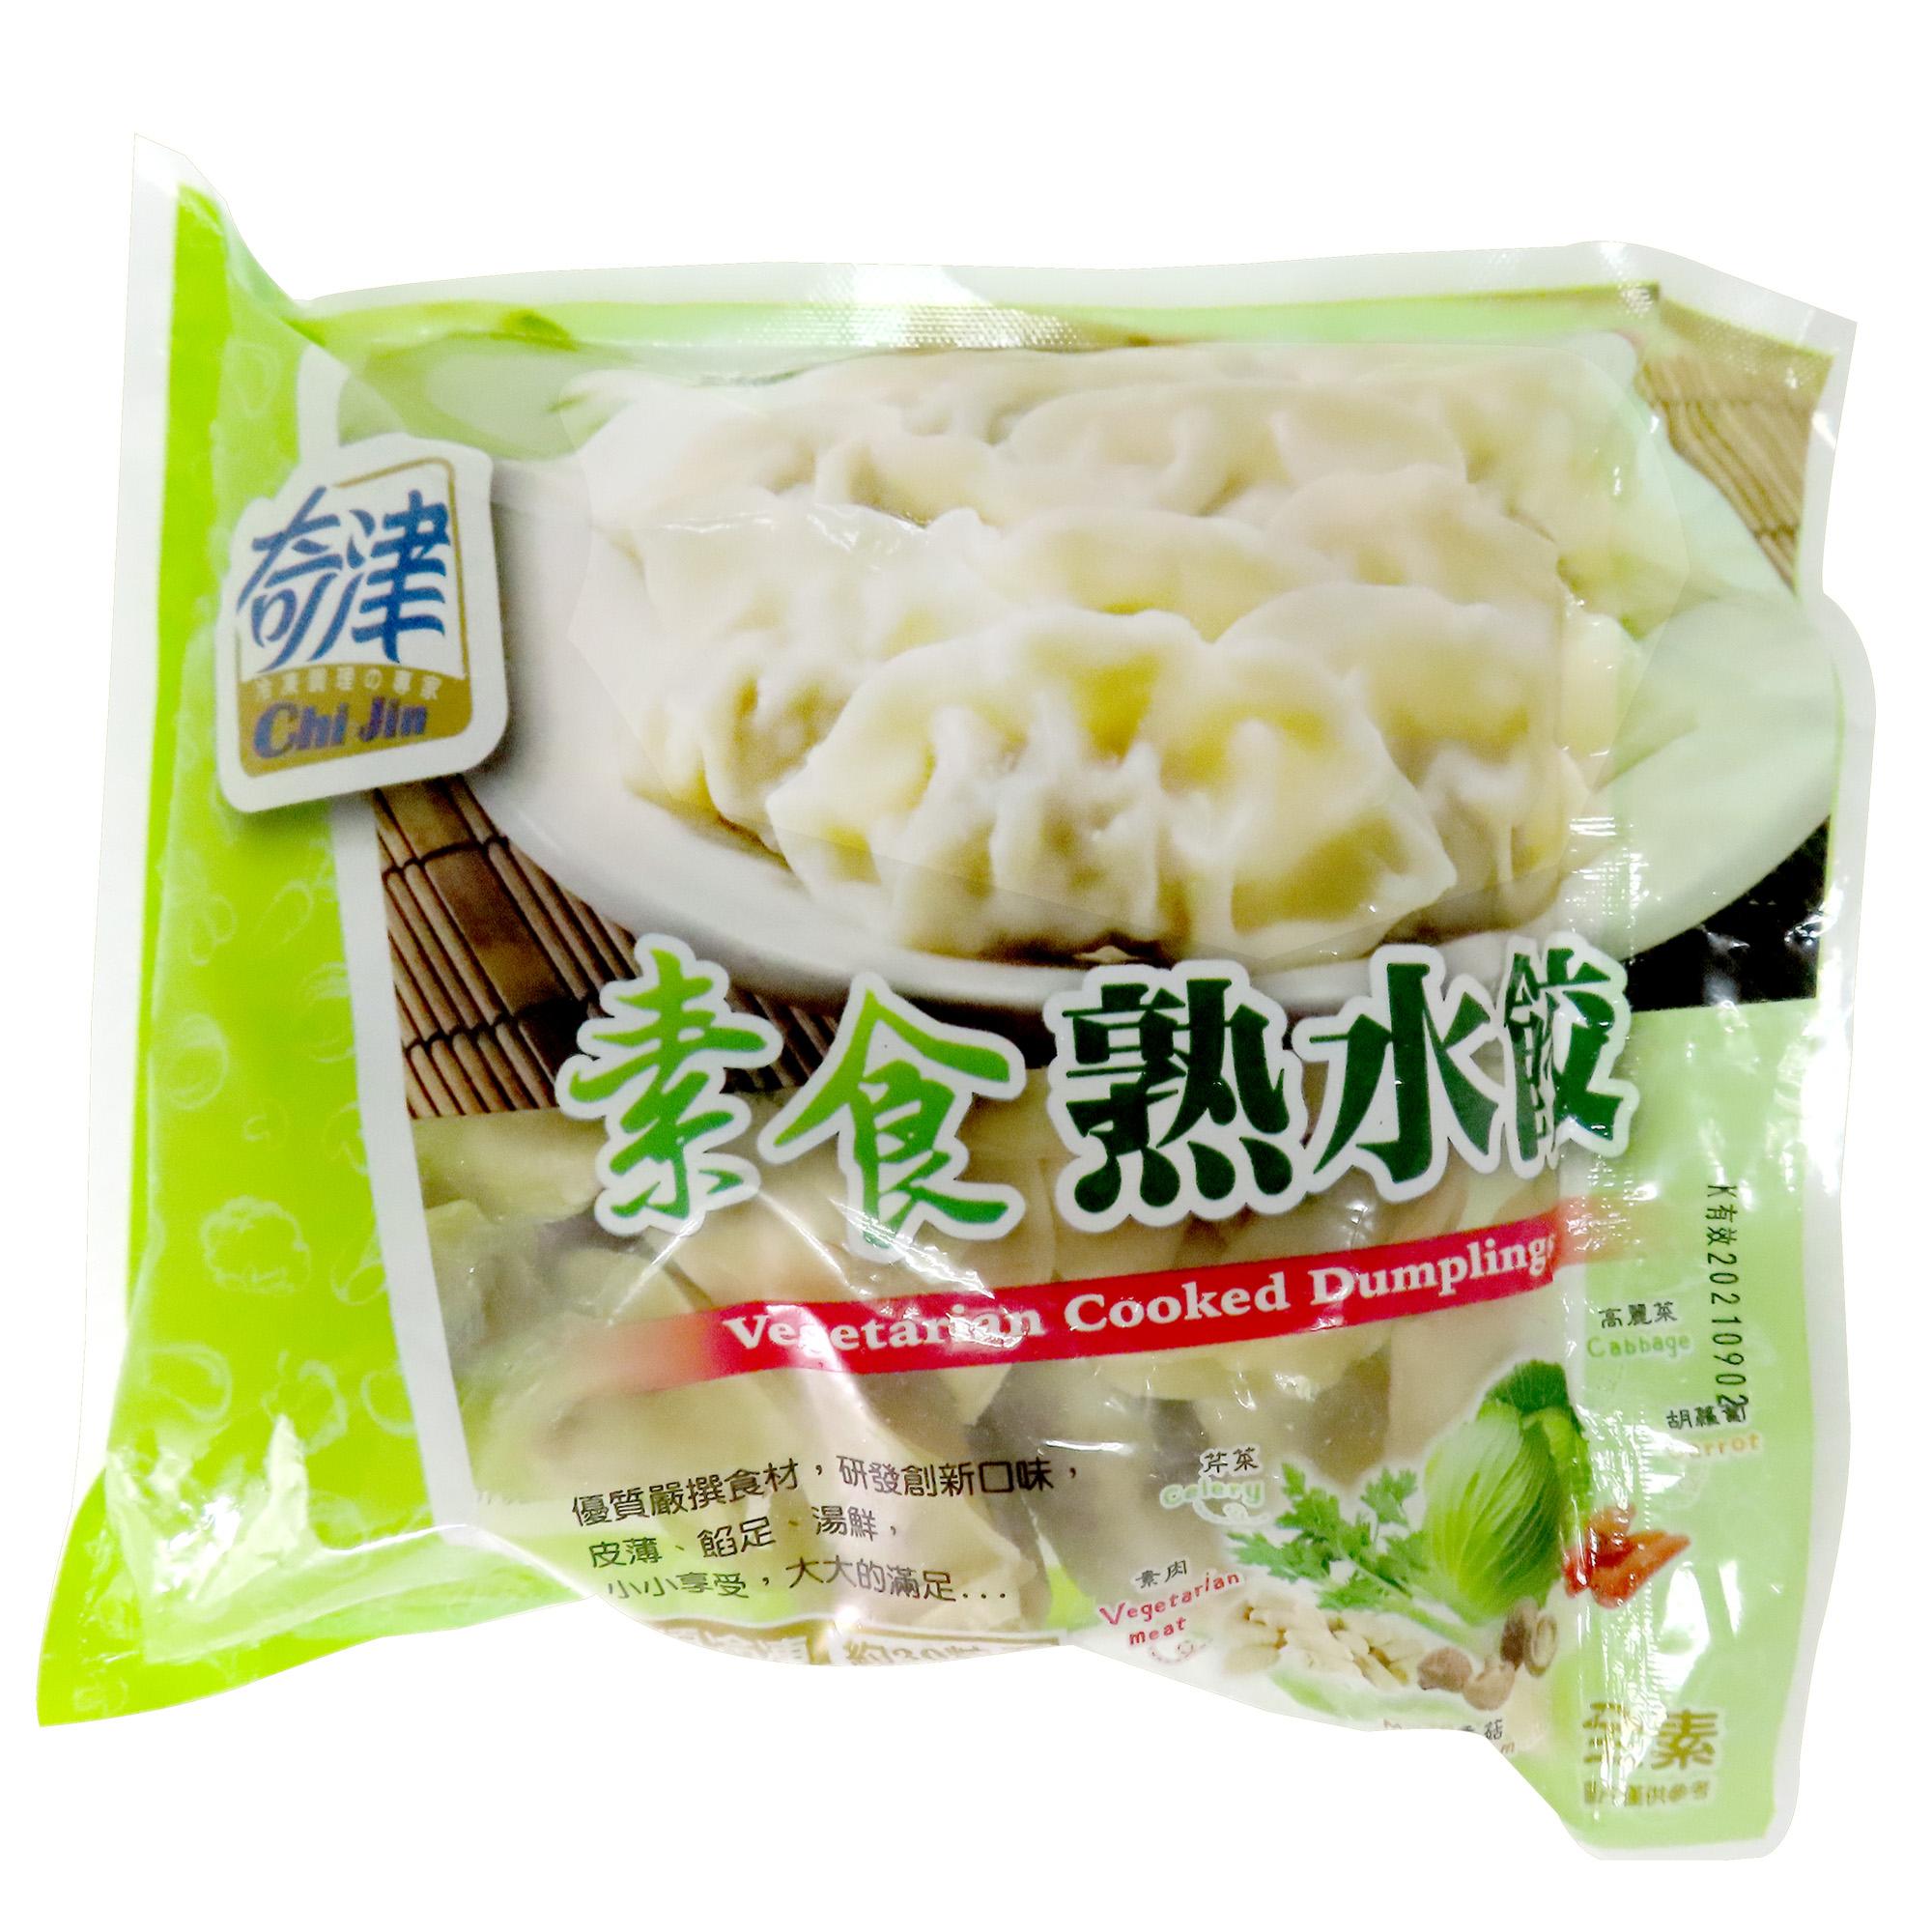 Image Vegetarian Cooked Dumplings 奇津 - 熟水饺 510grams